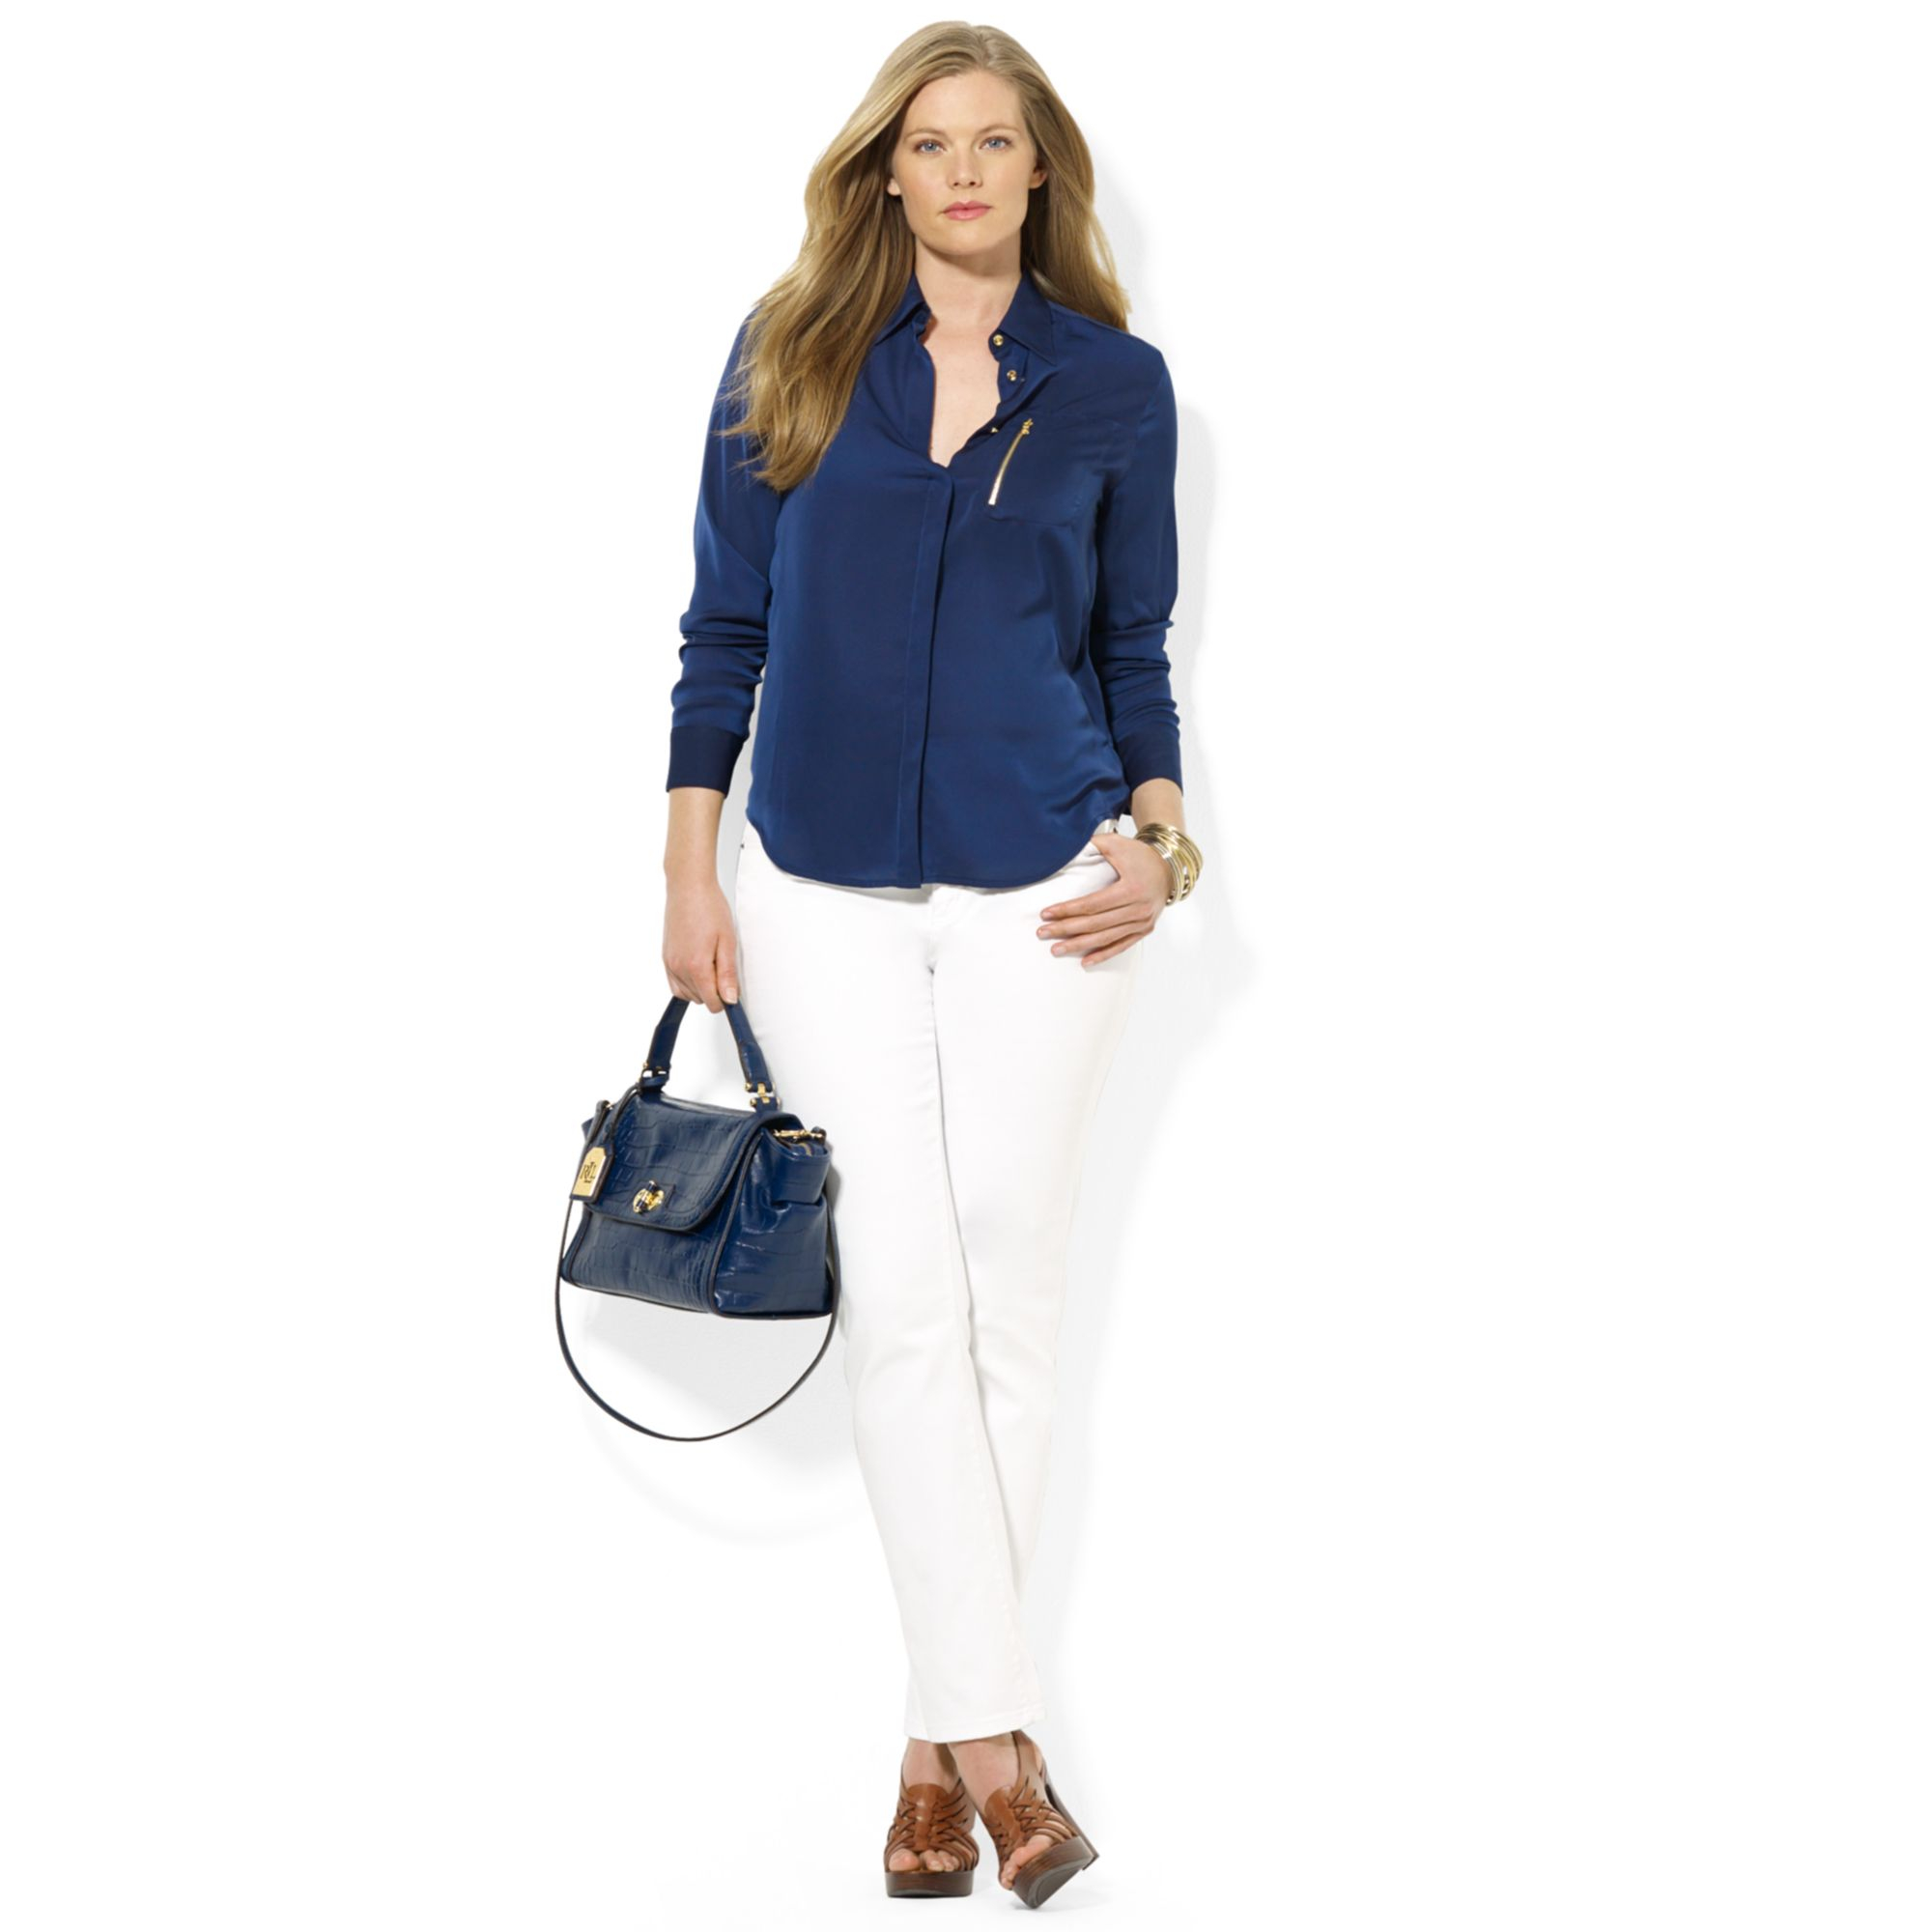 lyst lauren by ralph lauren plus size zippocket satin blouse in blue. Black Bedroom Furniture Sets. Home Design Ideas